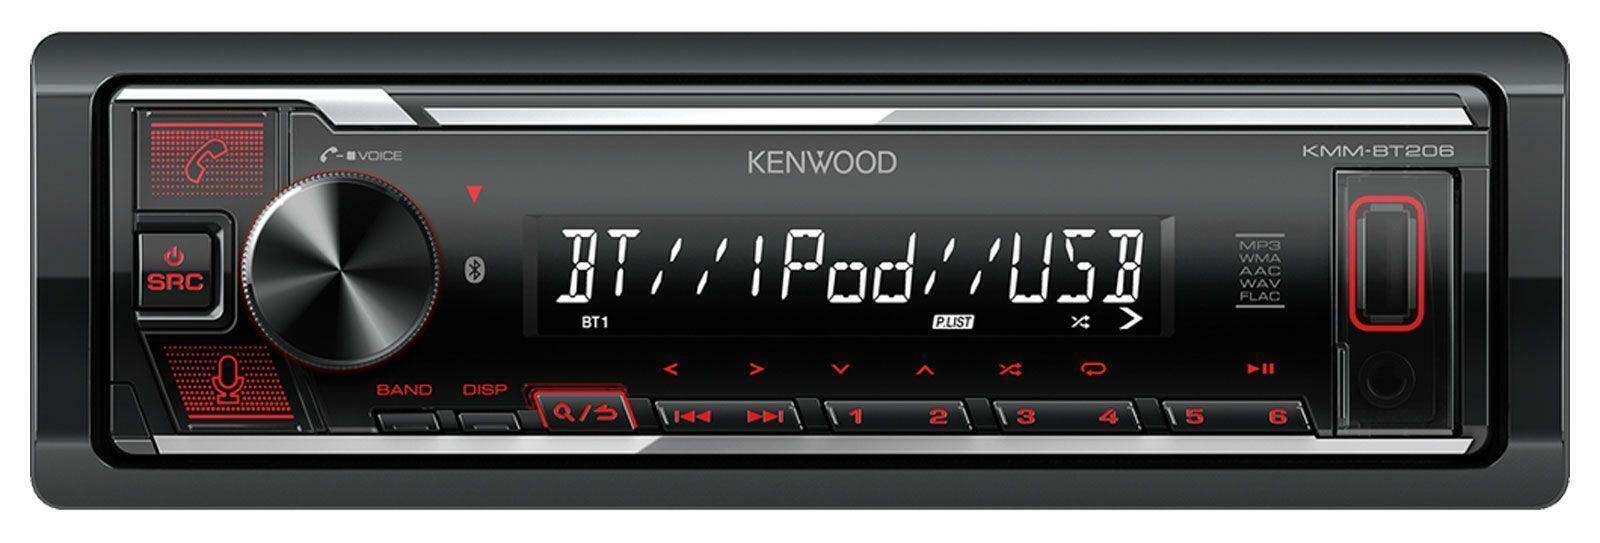 autoradio: Kenwood KMM-BT206 1-DIN Autoradio mit Bluetooth USB iPhone AUX-IN Amazon Alexa